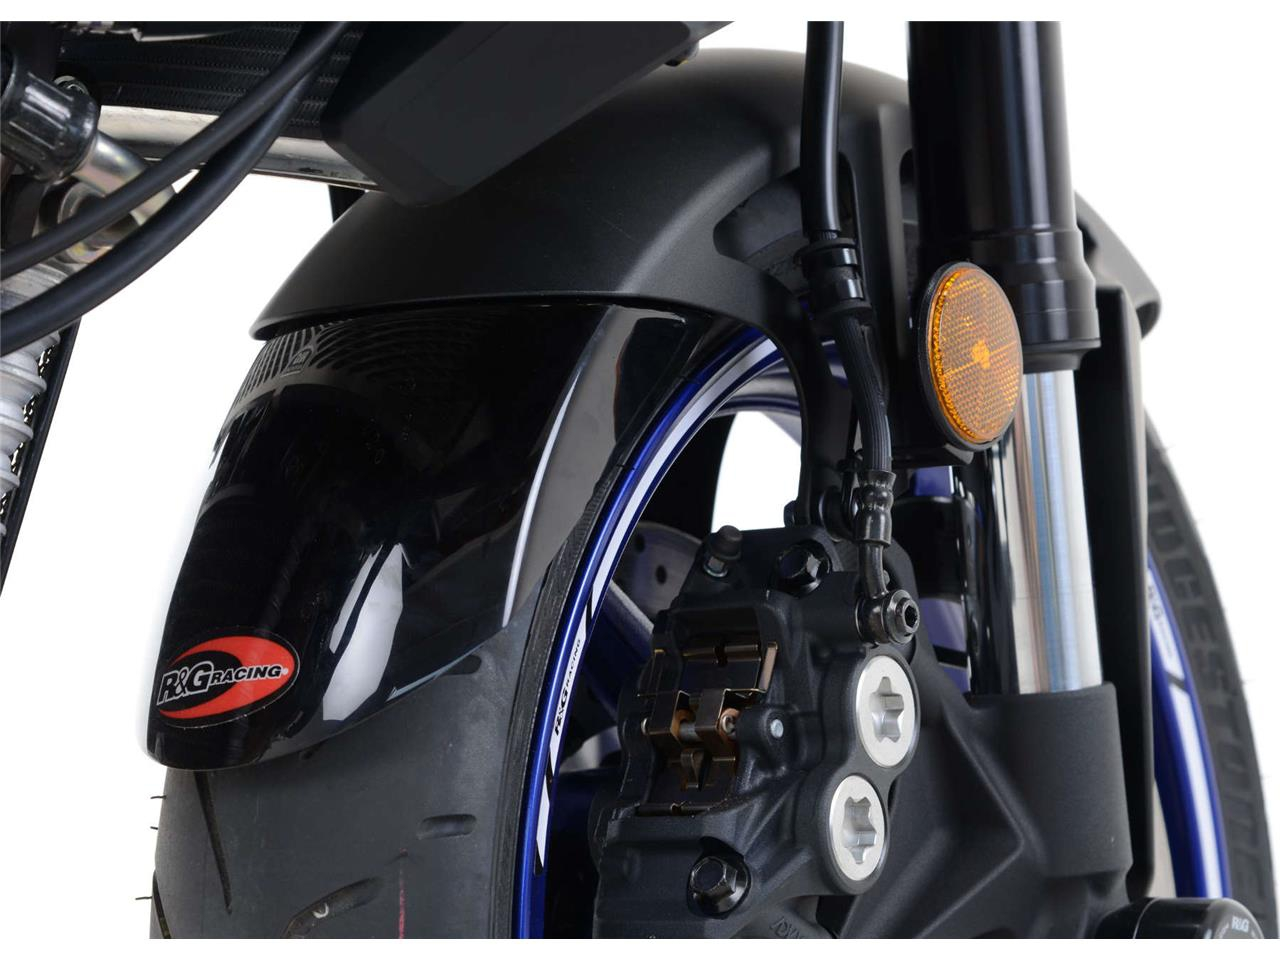 extension garde boue moto yamaha yzf r6 2017 rg racing. Black Bedroom Furniture Sets. Home Design Ideas